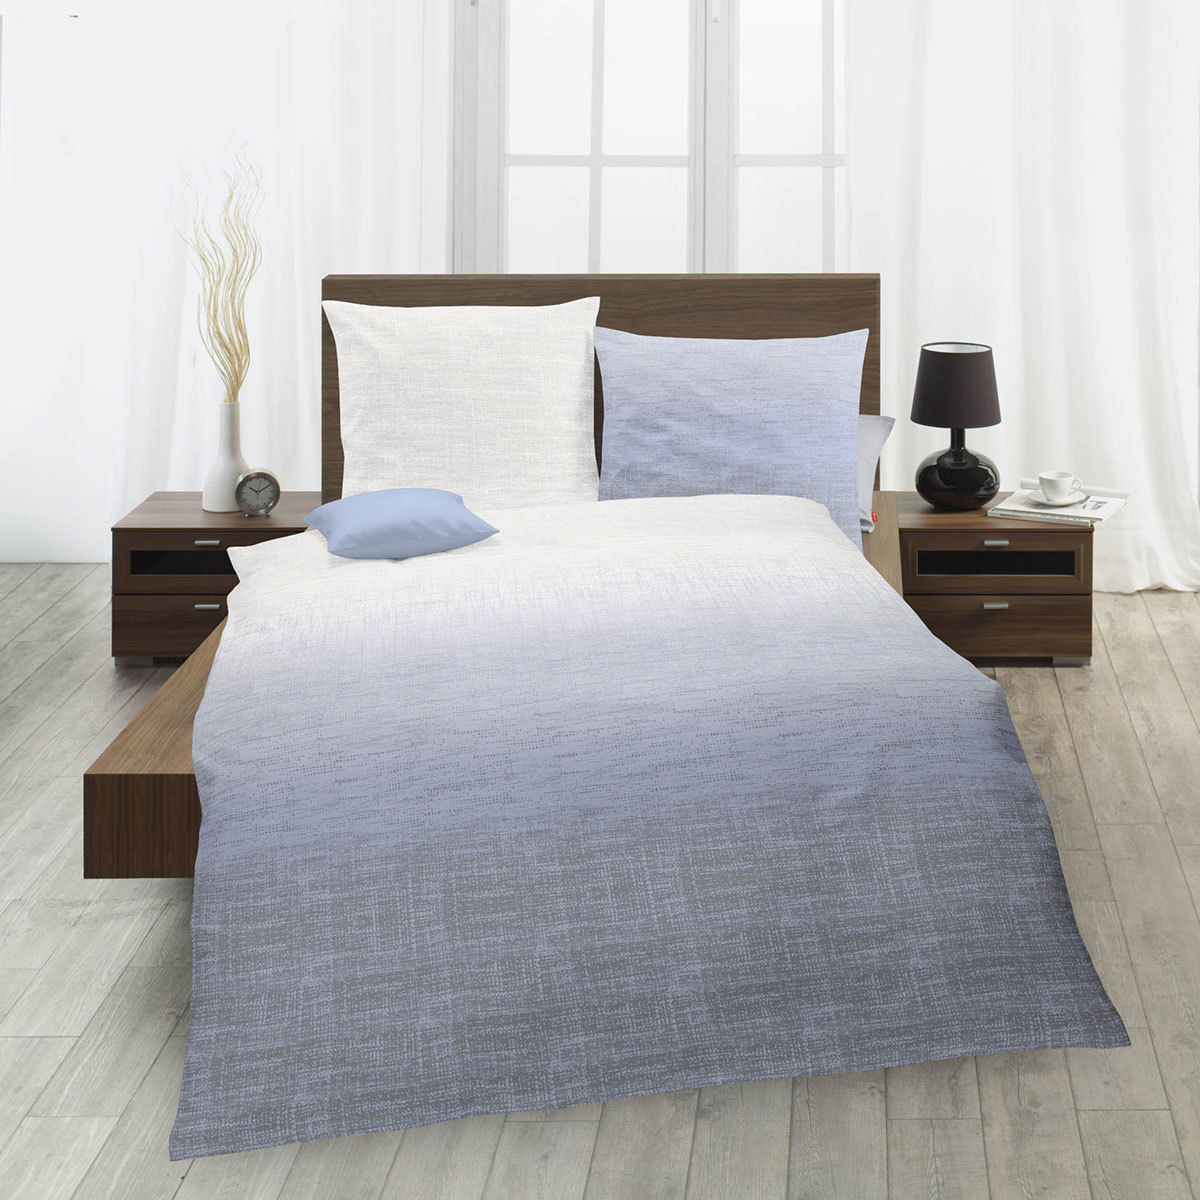 fleuresse mako satin bettw sche modern life 113779 0002. Black Bedroom Furniture Sets. Home Design Ideas